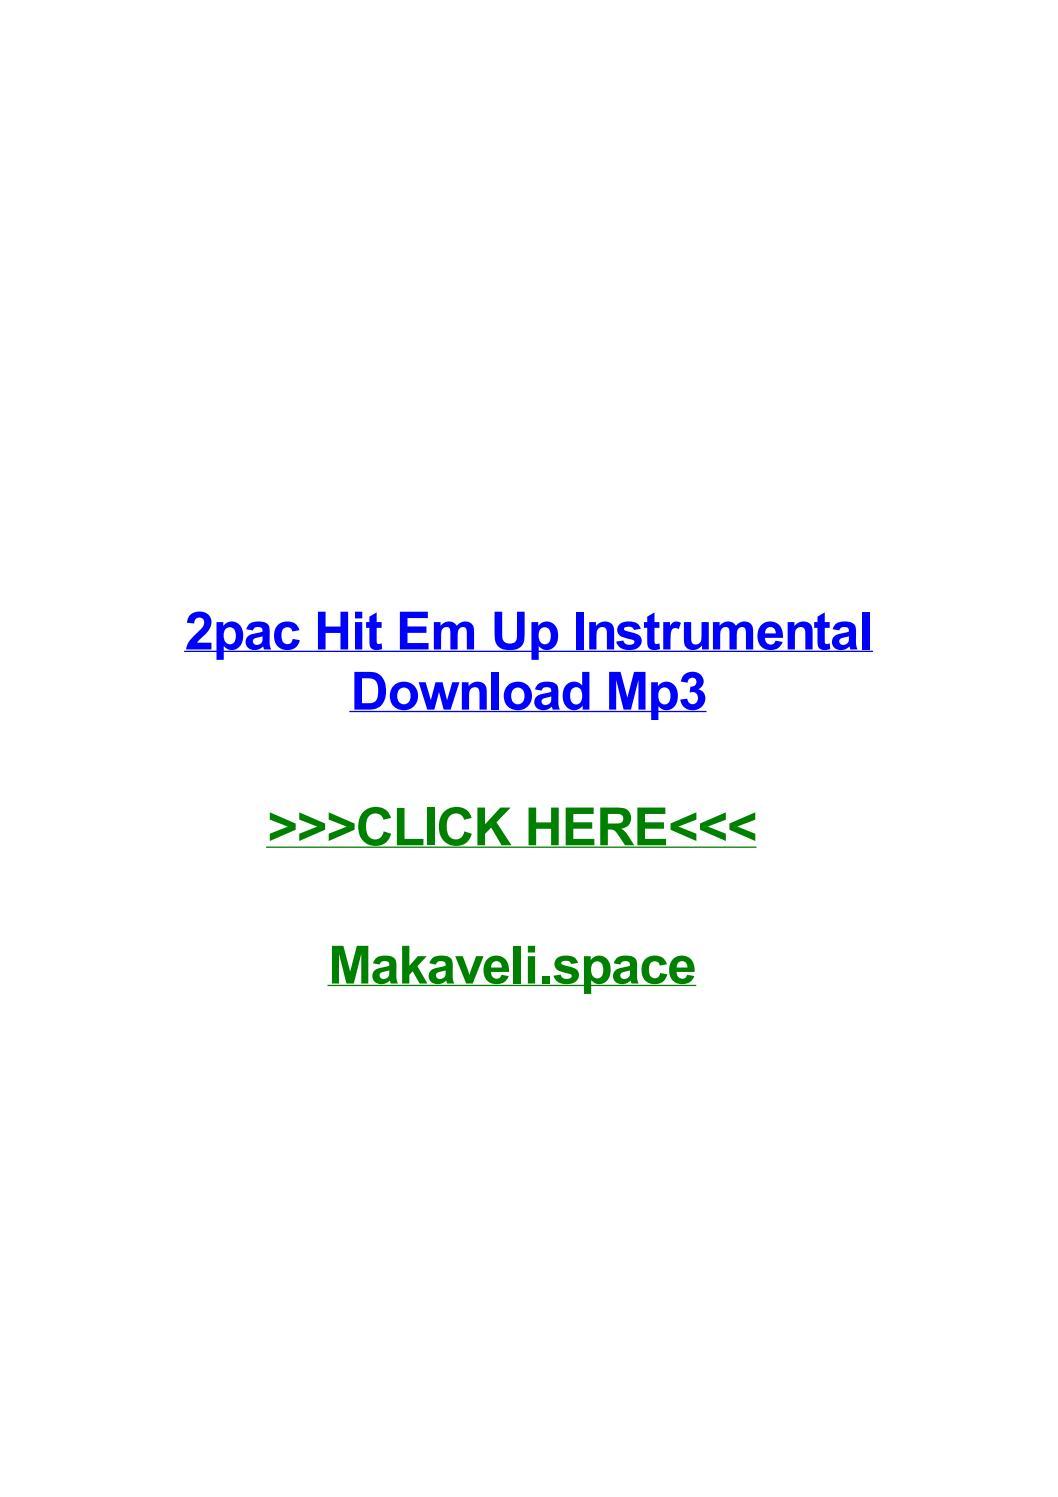 2pac hit em up instrumental download mp3 by melissareet - issuu